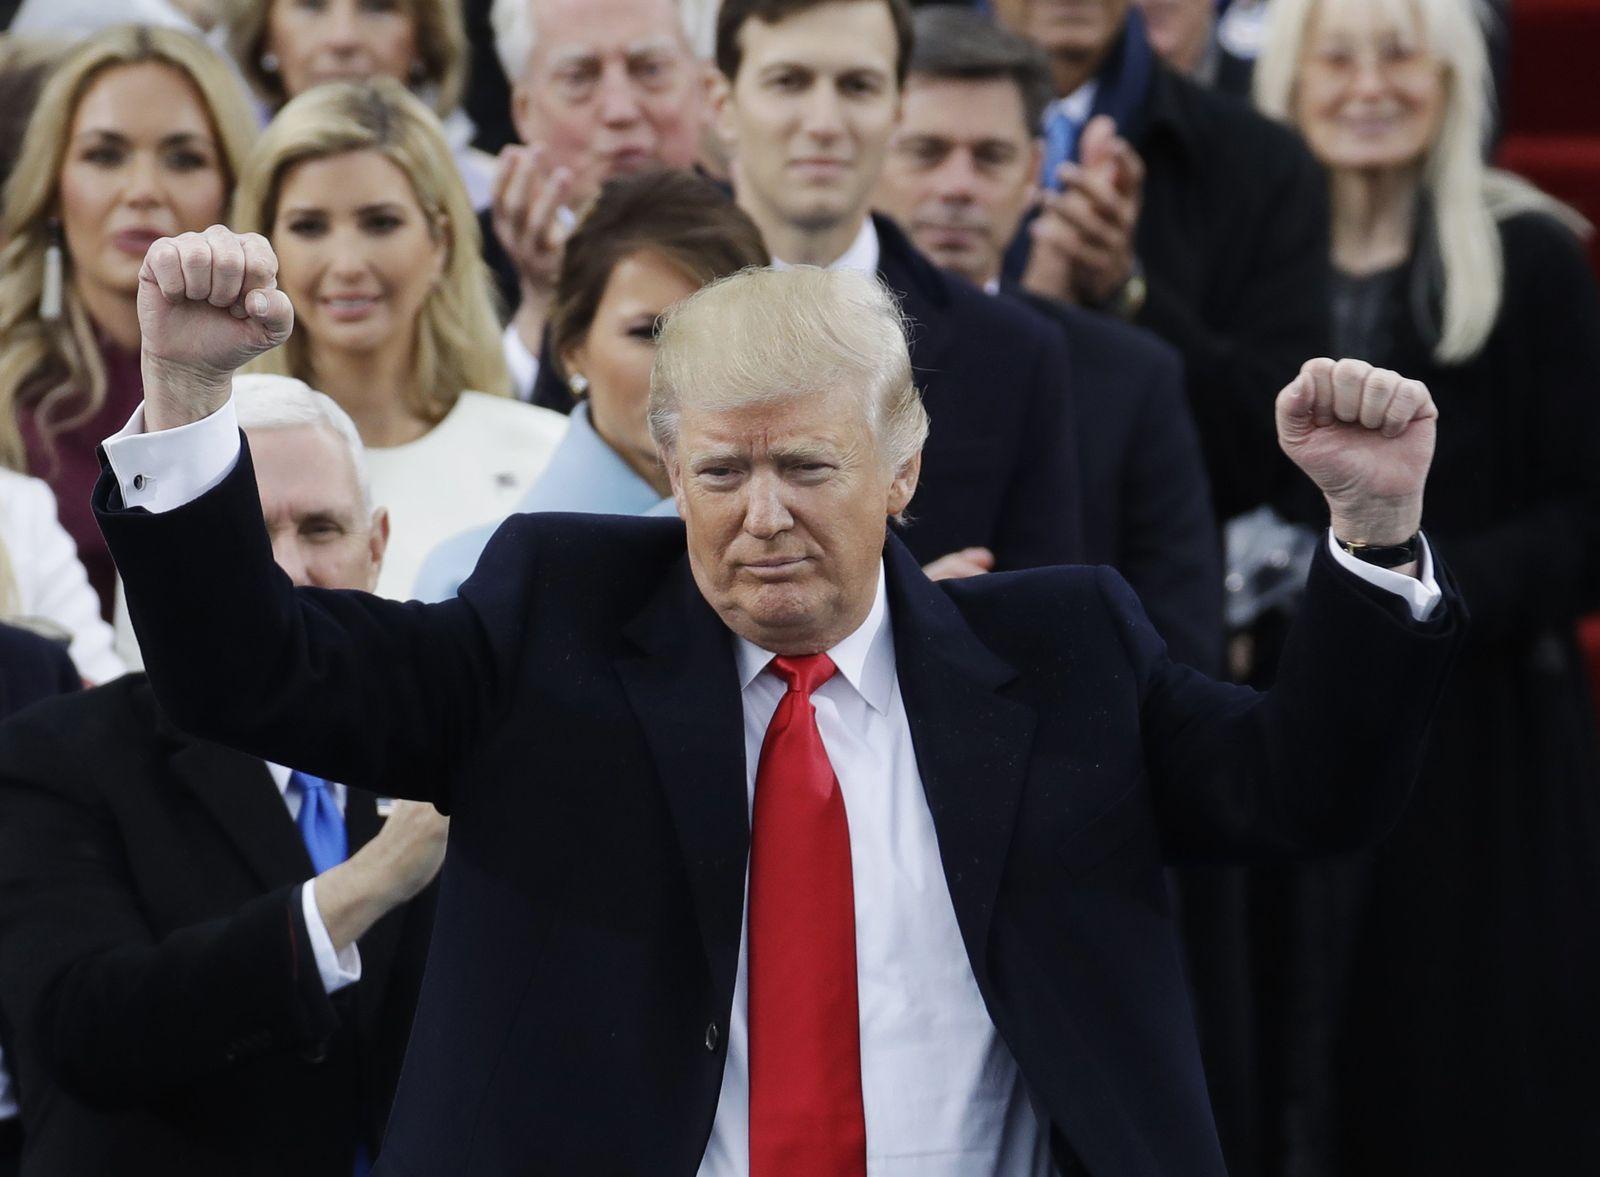 Trump/ Amtseinführung/ Jubel